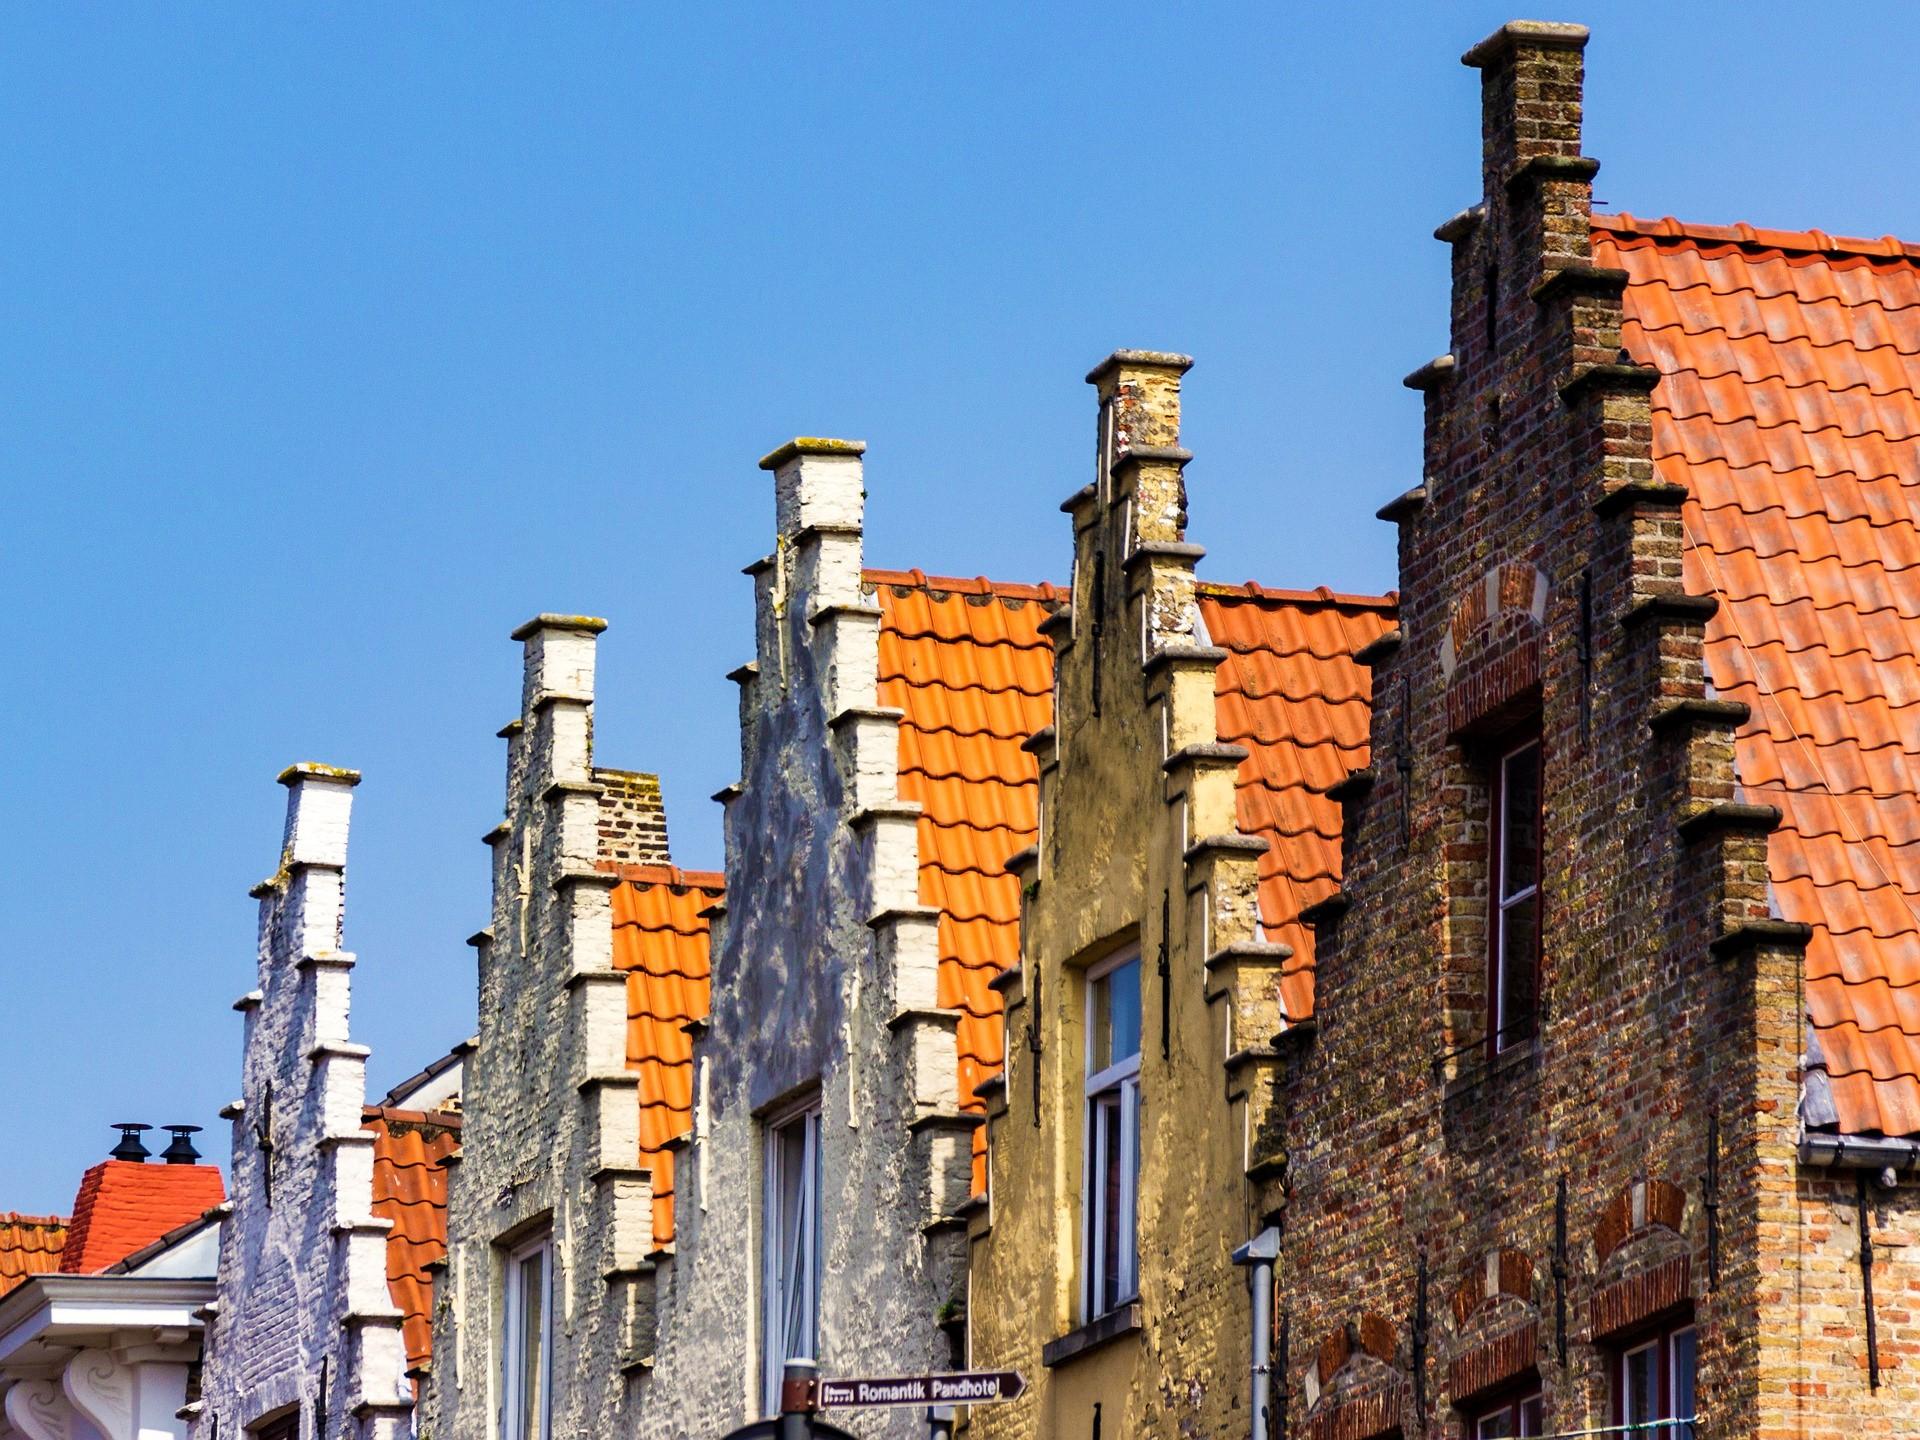 Almshouses in Bruges - Bruges top attractions